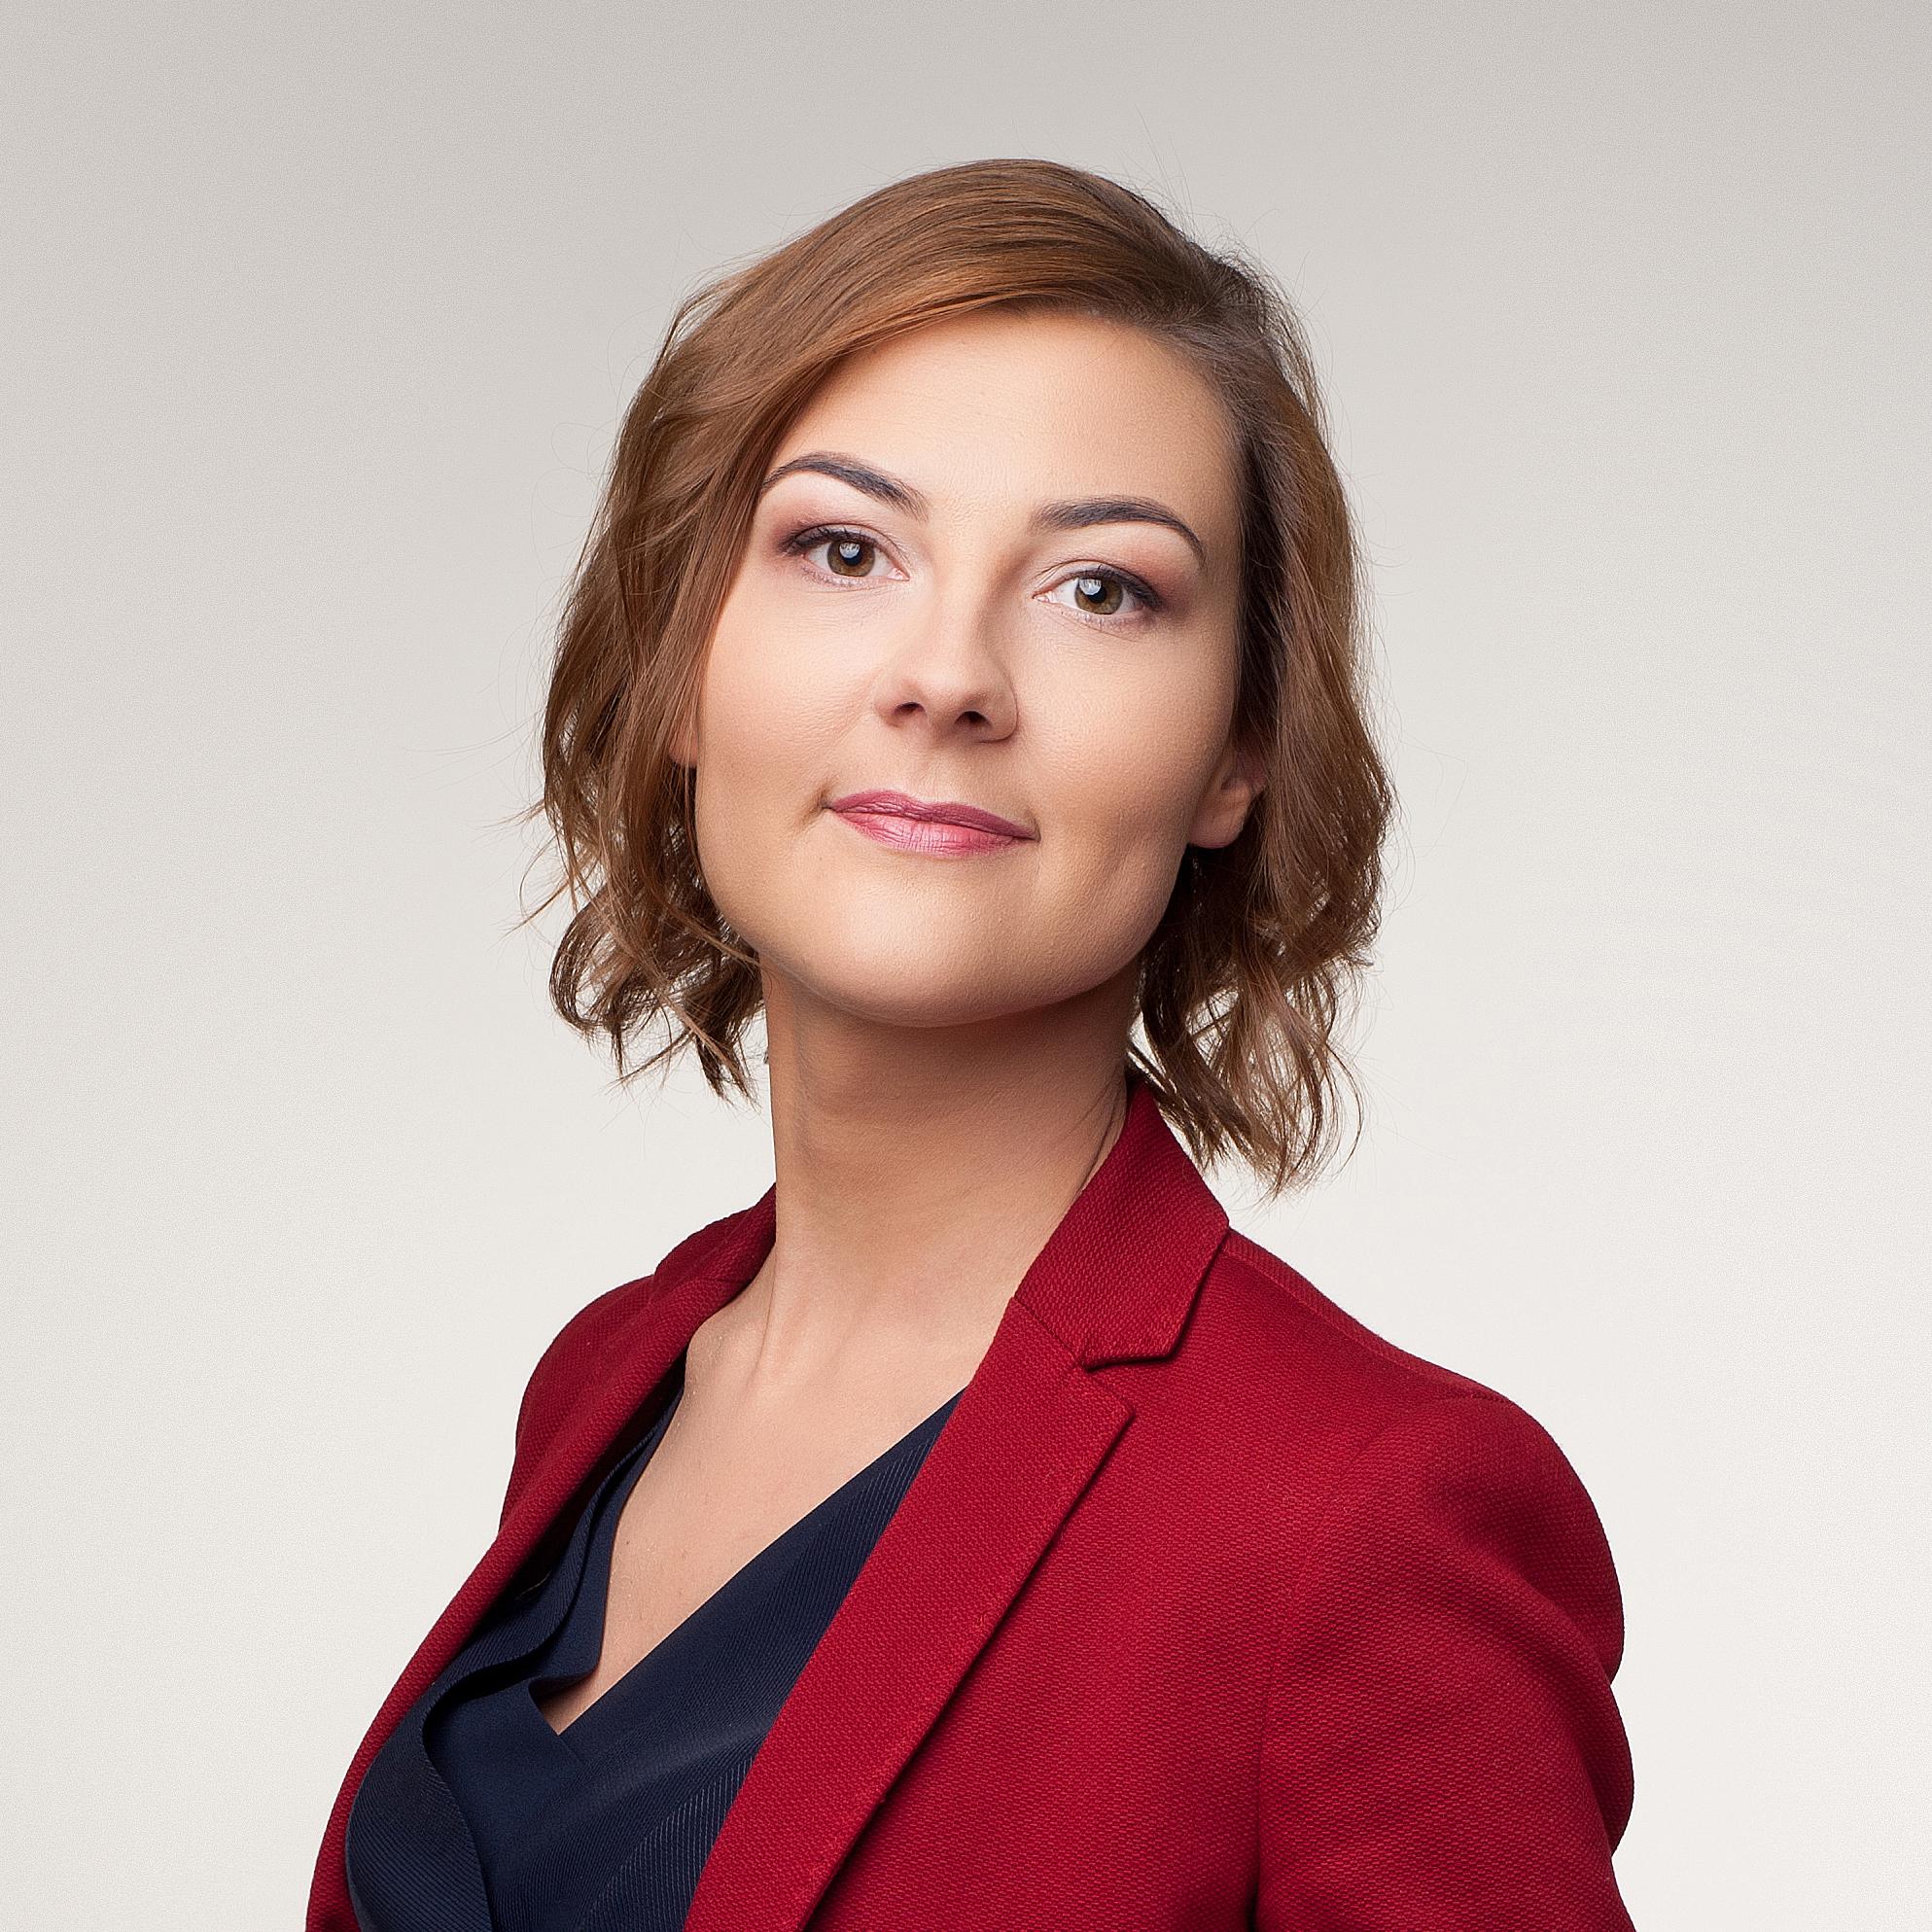 Lina Kilimonytė